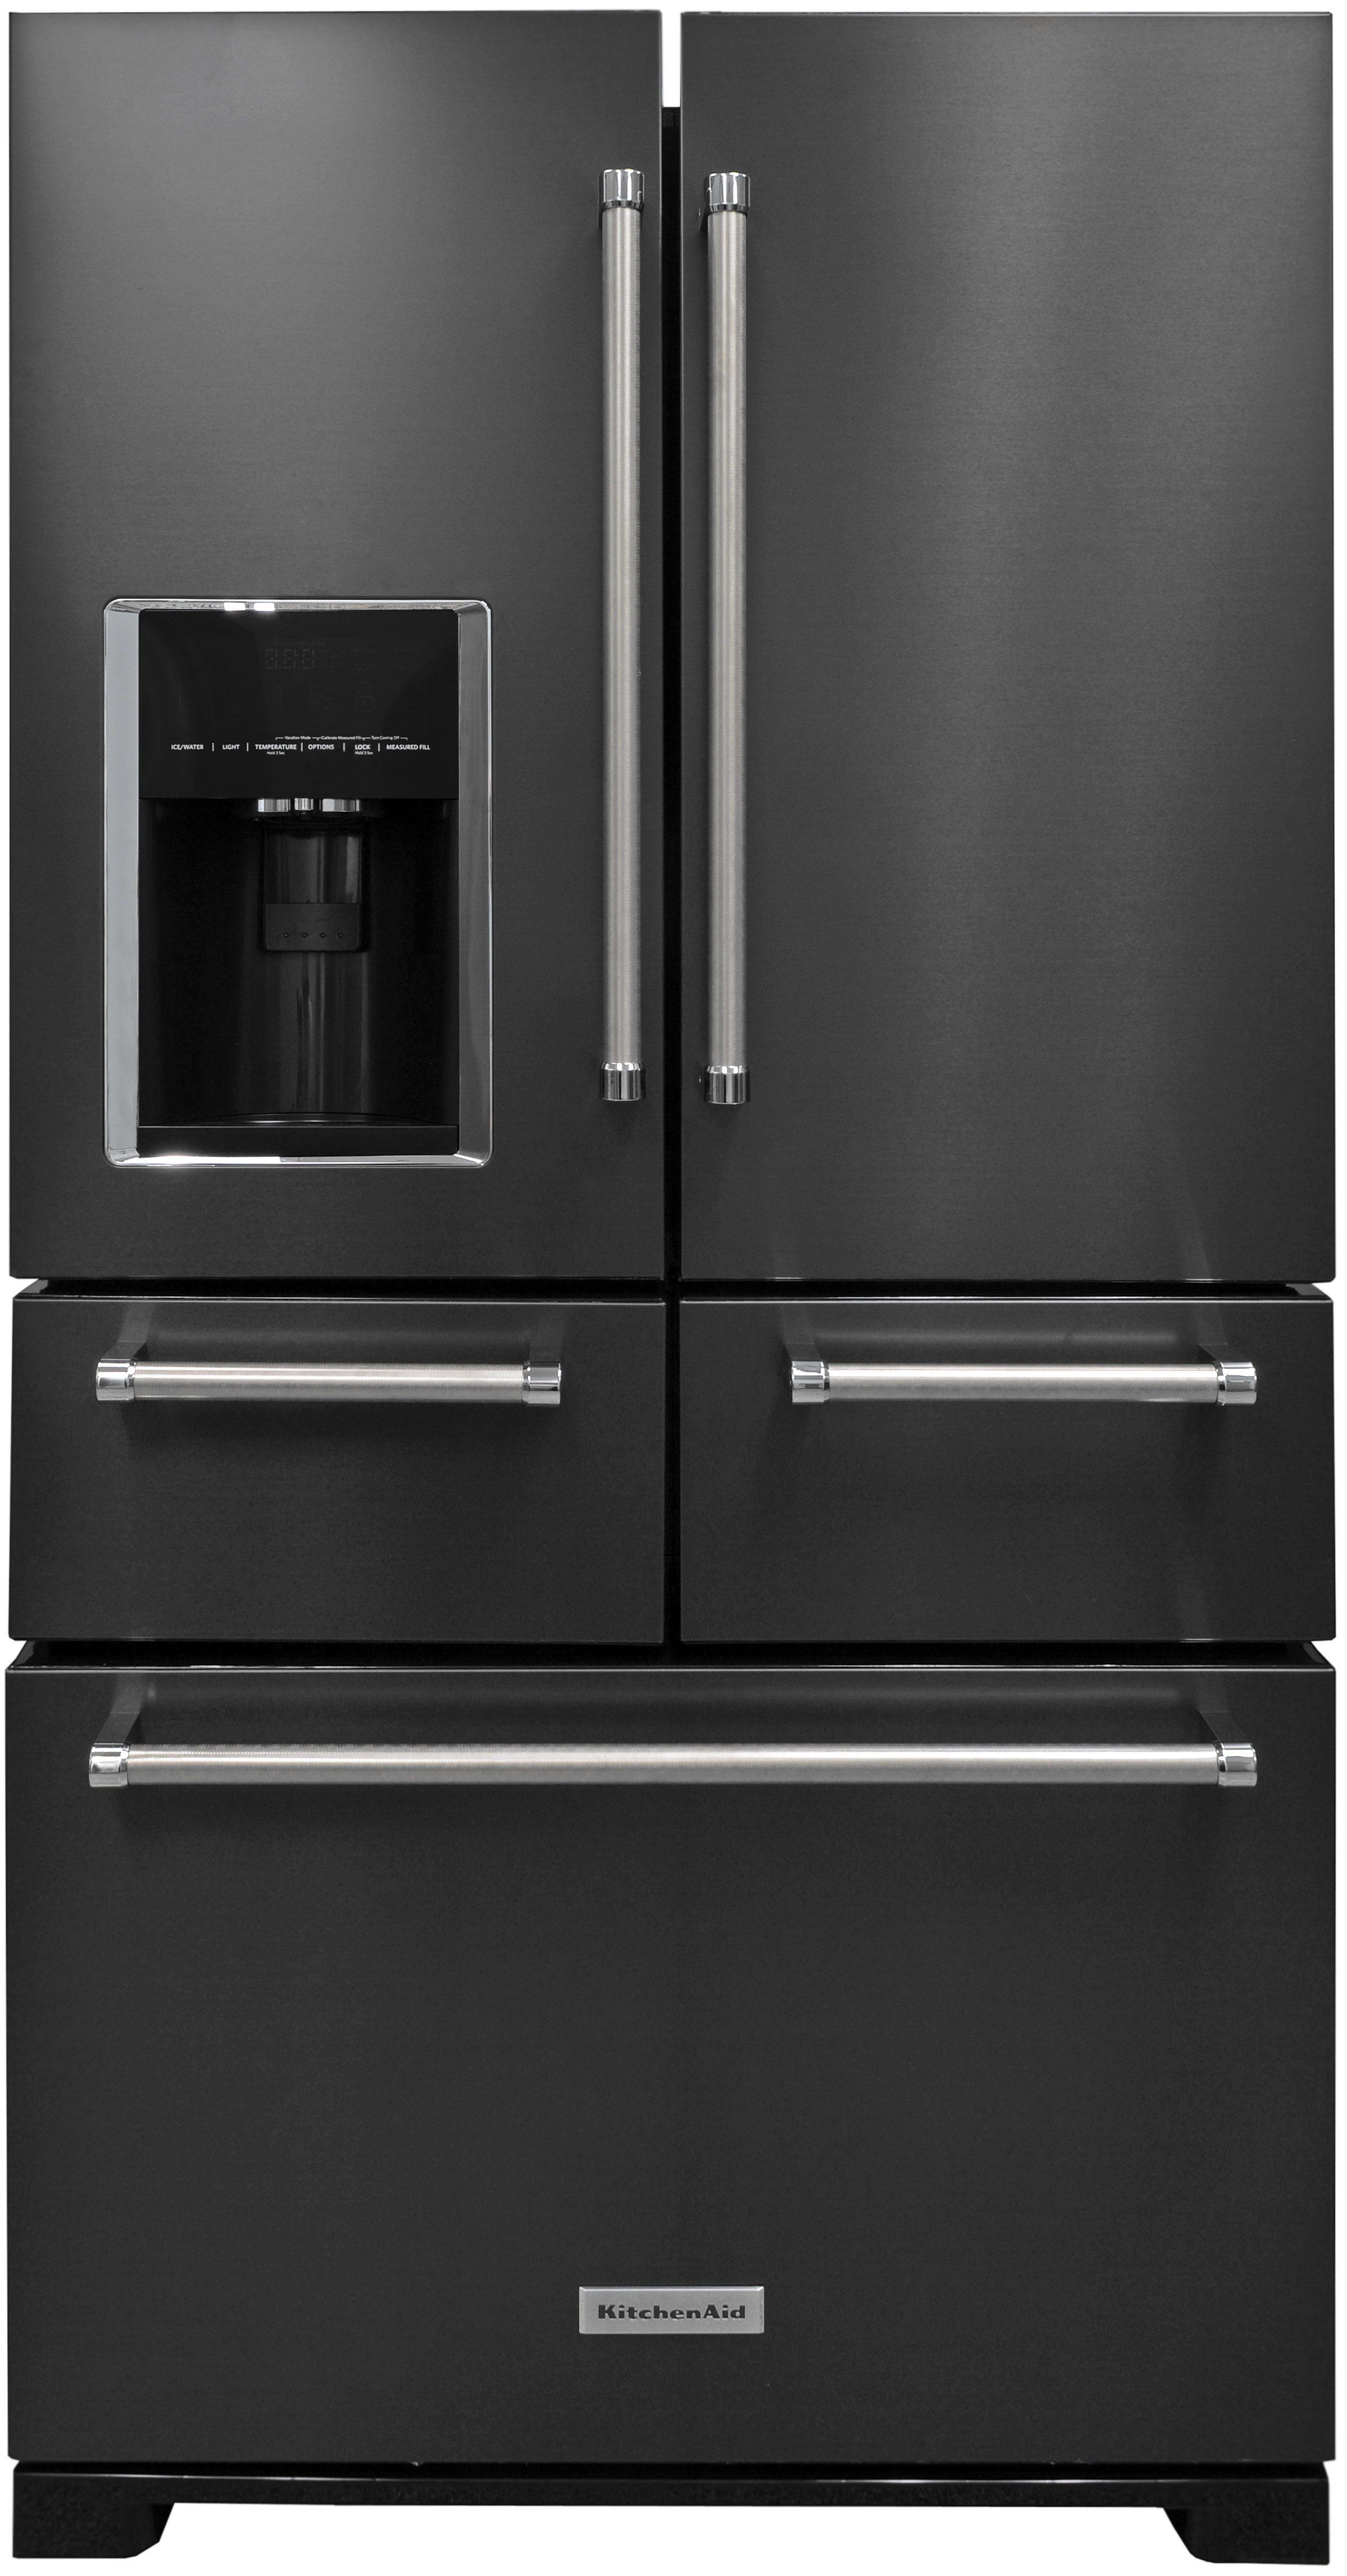 Kitchenaid krmf706ebs refrigerator review reviewed refrigerators the kitchenaid krmf706ebs a five door black stainless steel fridge sounds crazy rubansaba